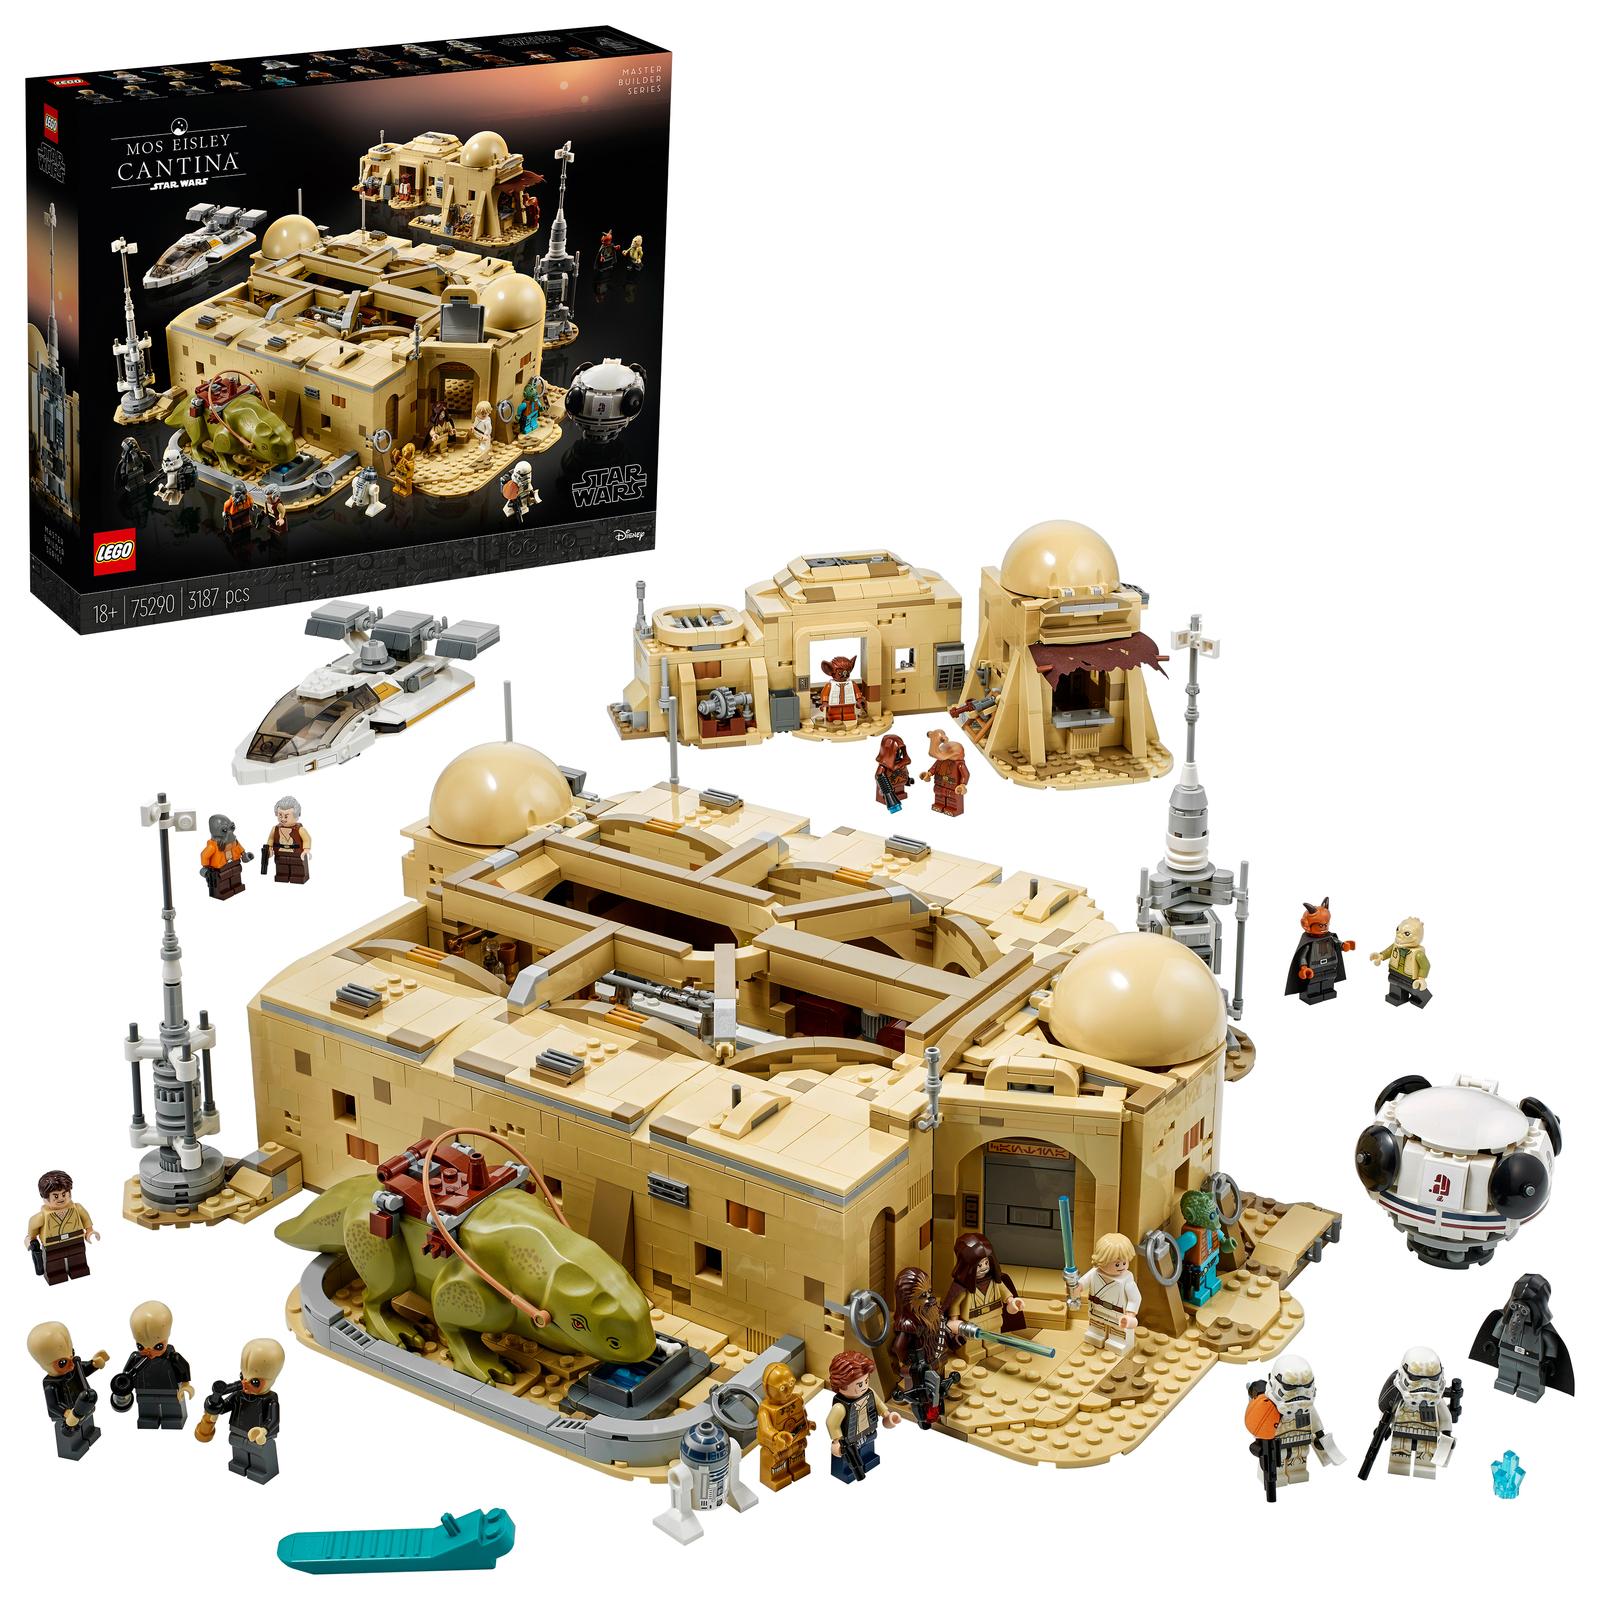 15% off Selected LEGO @ shopDisney e.g LEGO Star Wars Mos Eisley Cantina Set 75290 £271.99 / LEGO Star Wars Destroyer Set 75252 £549.99